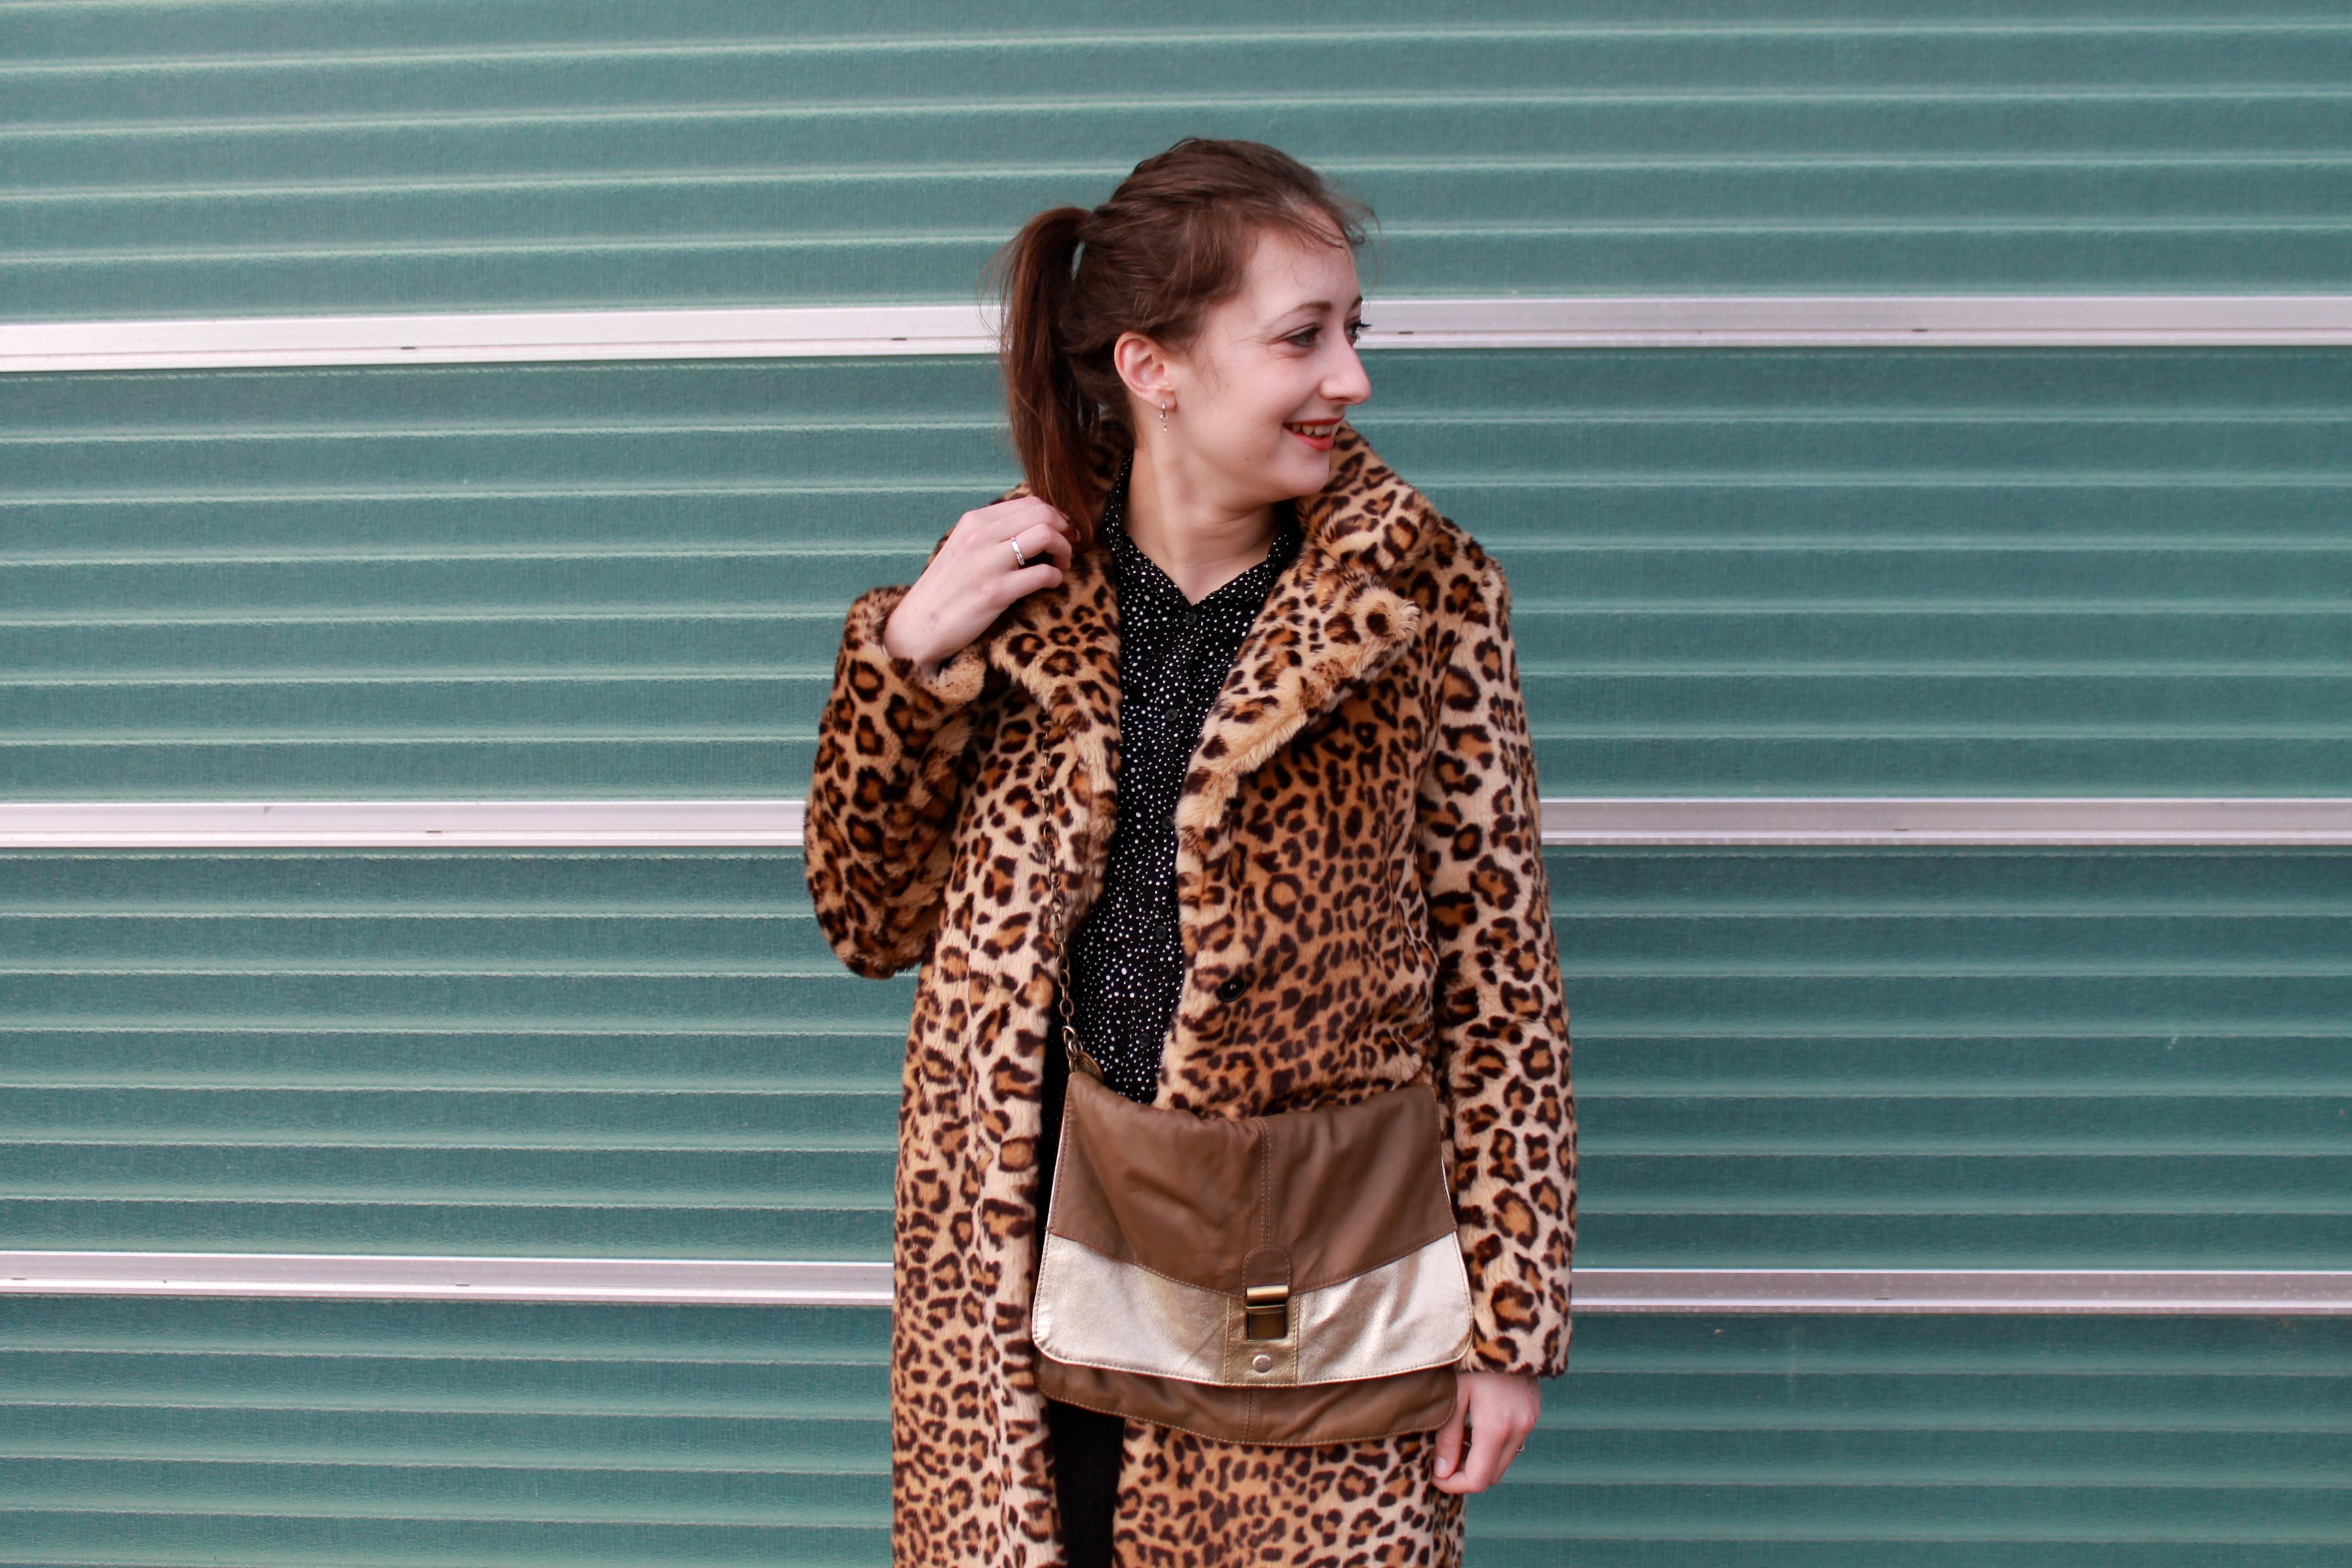 Outfit of the day | Sneakers, luipaard jas én een gouden tas